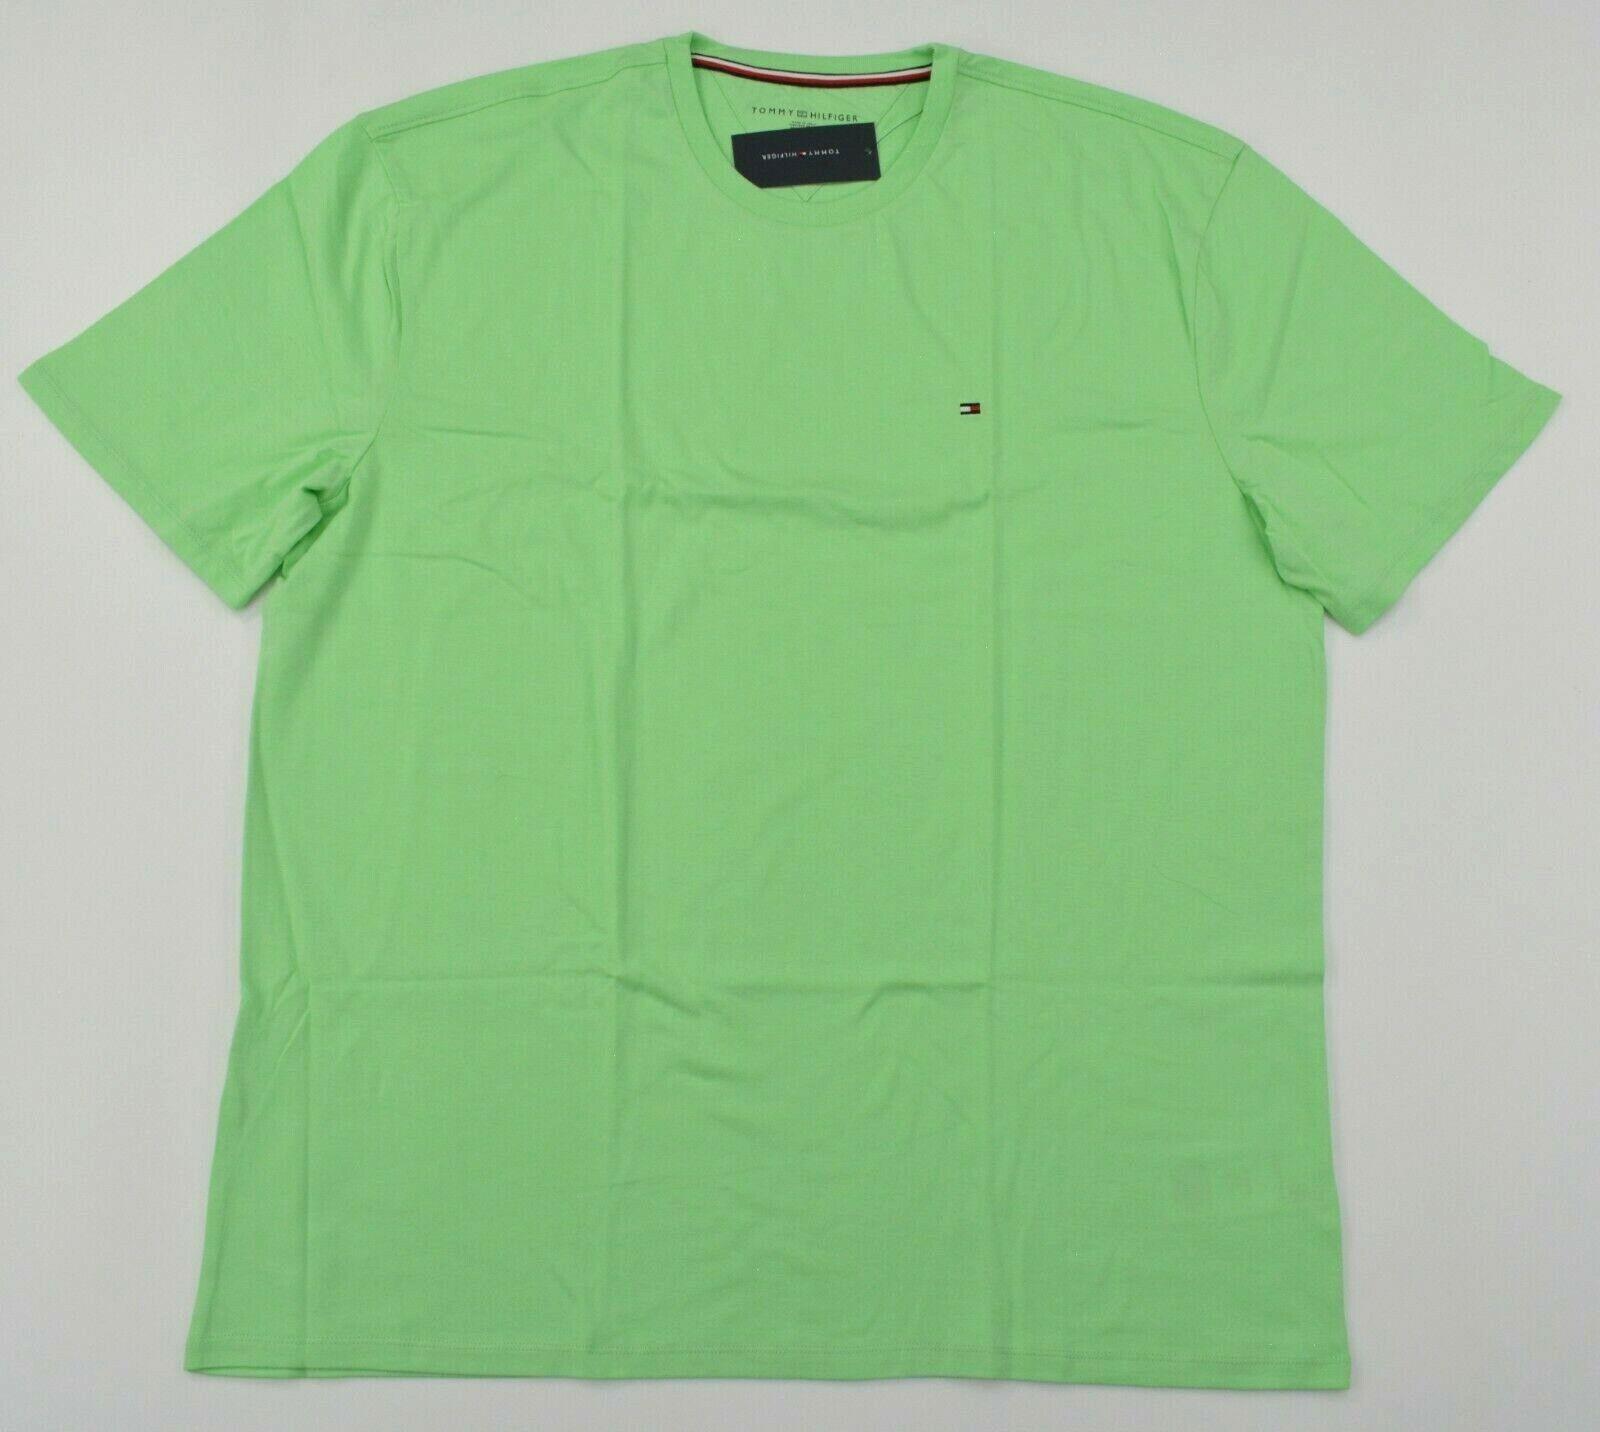 LimeGreen-9804_330